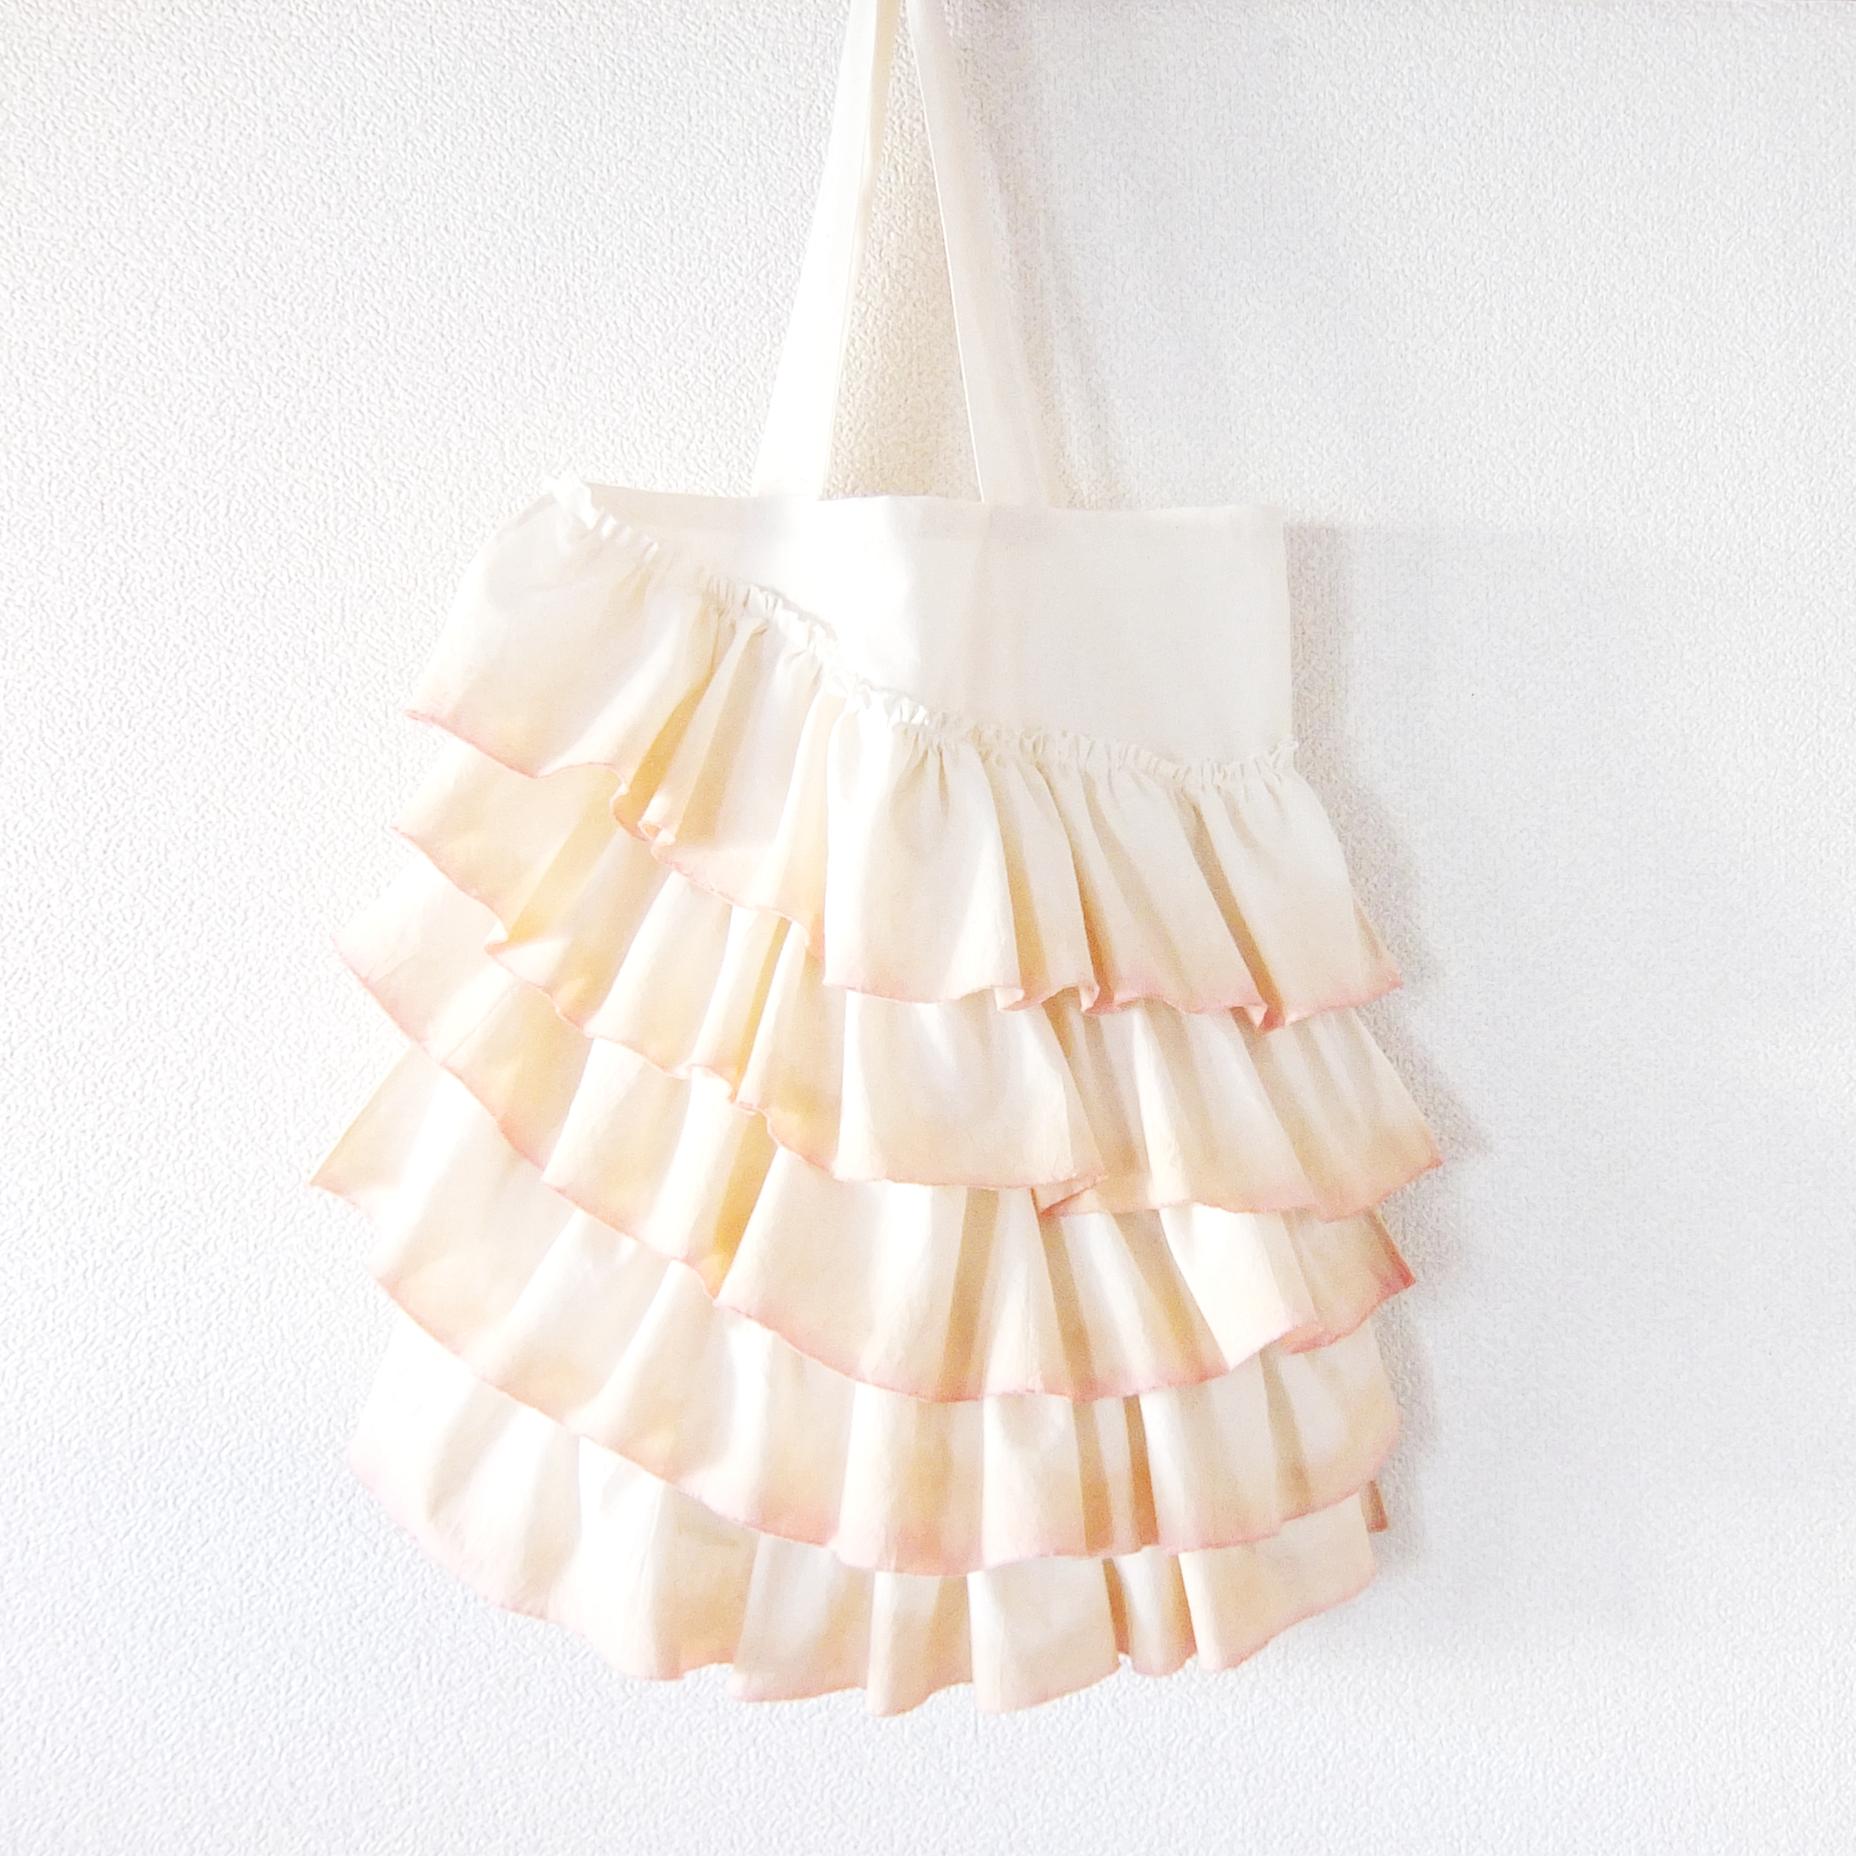 milk tea bag